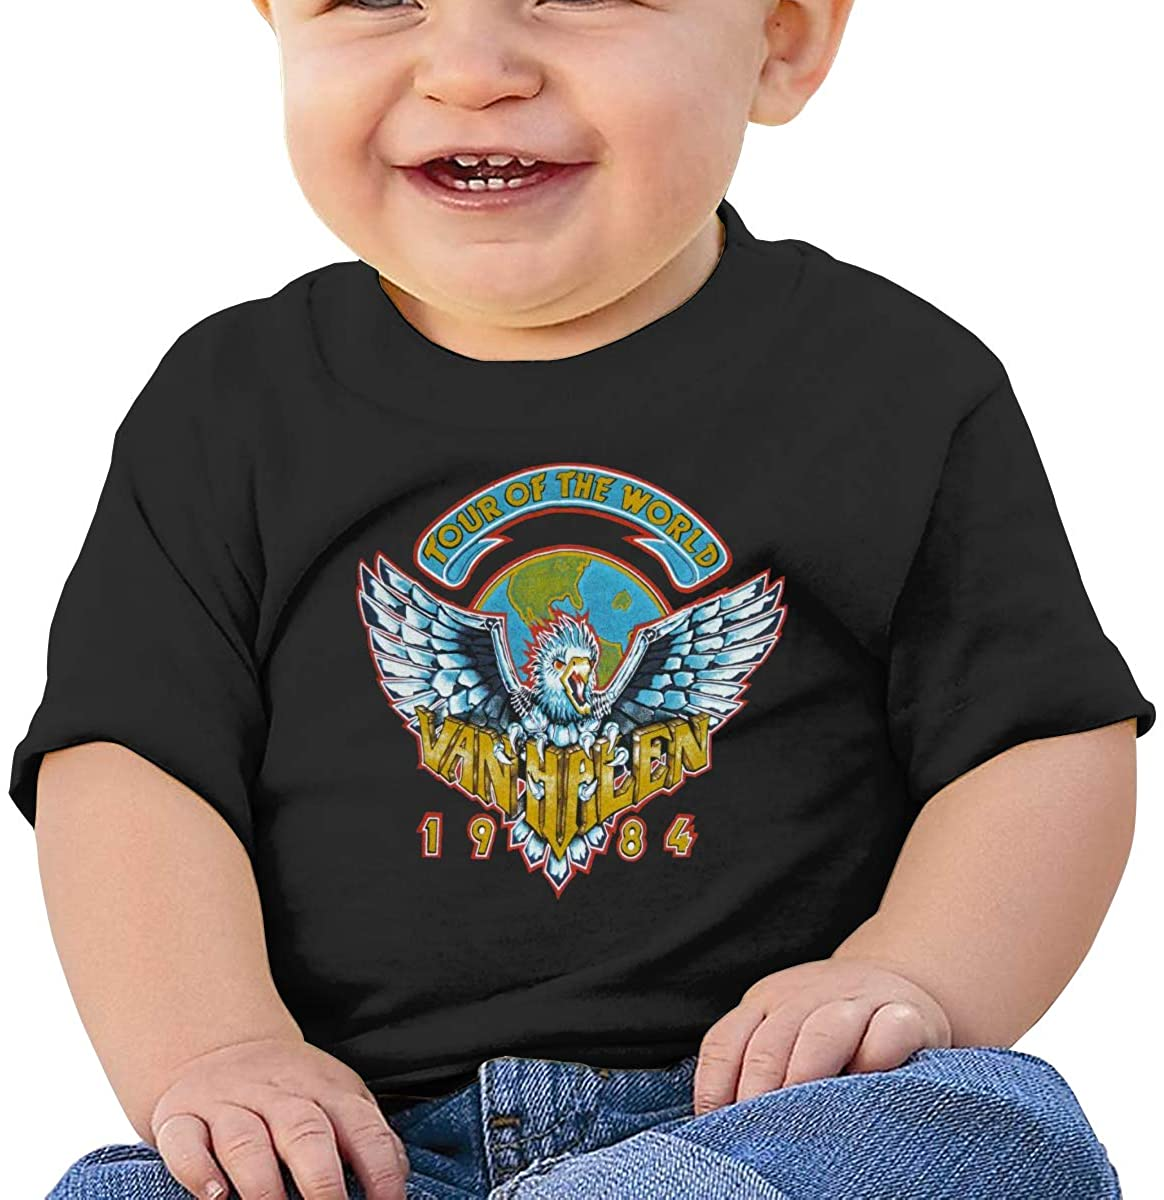 Joseph E Hinton 1984 Band 6 Months Baby Casual Fashion Short Sleeve T-Shirt Printing Design Baby Tee Black